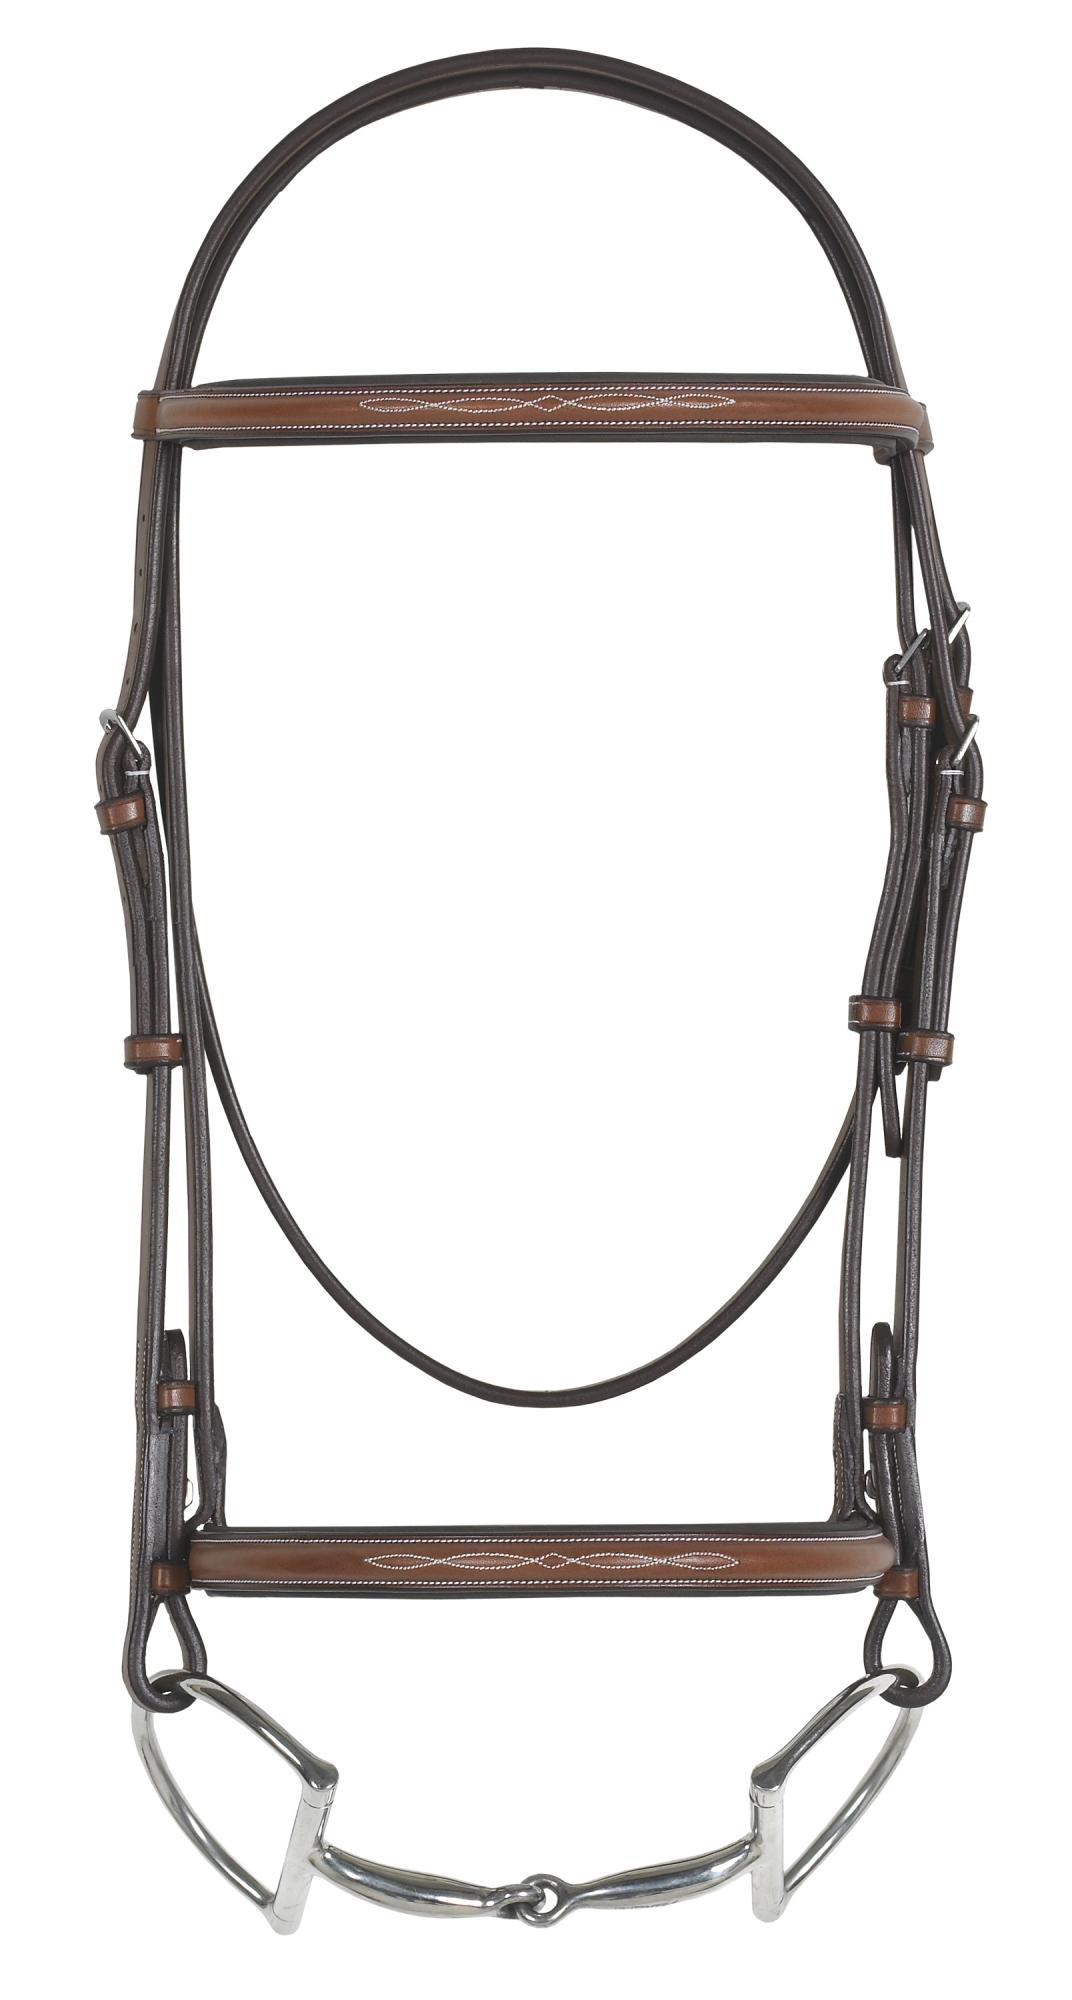 Rodrigo Pessoa® Fancy Raised Padded Bridle w/o reins